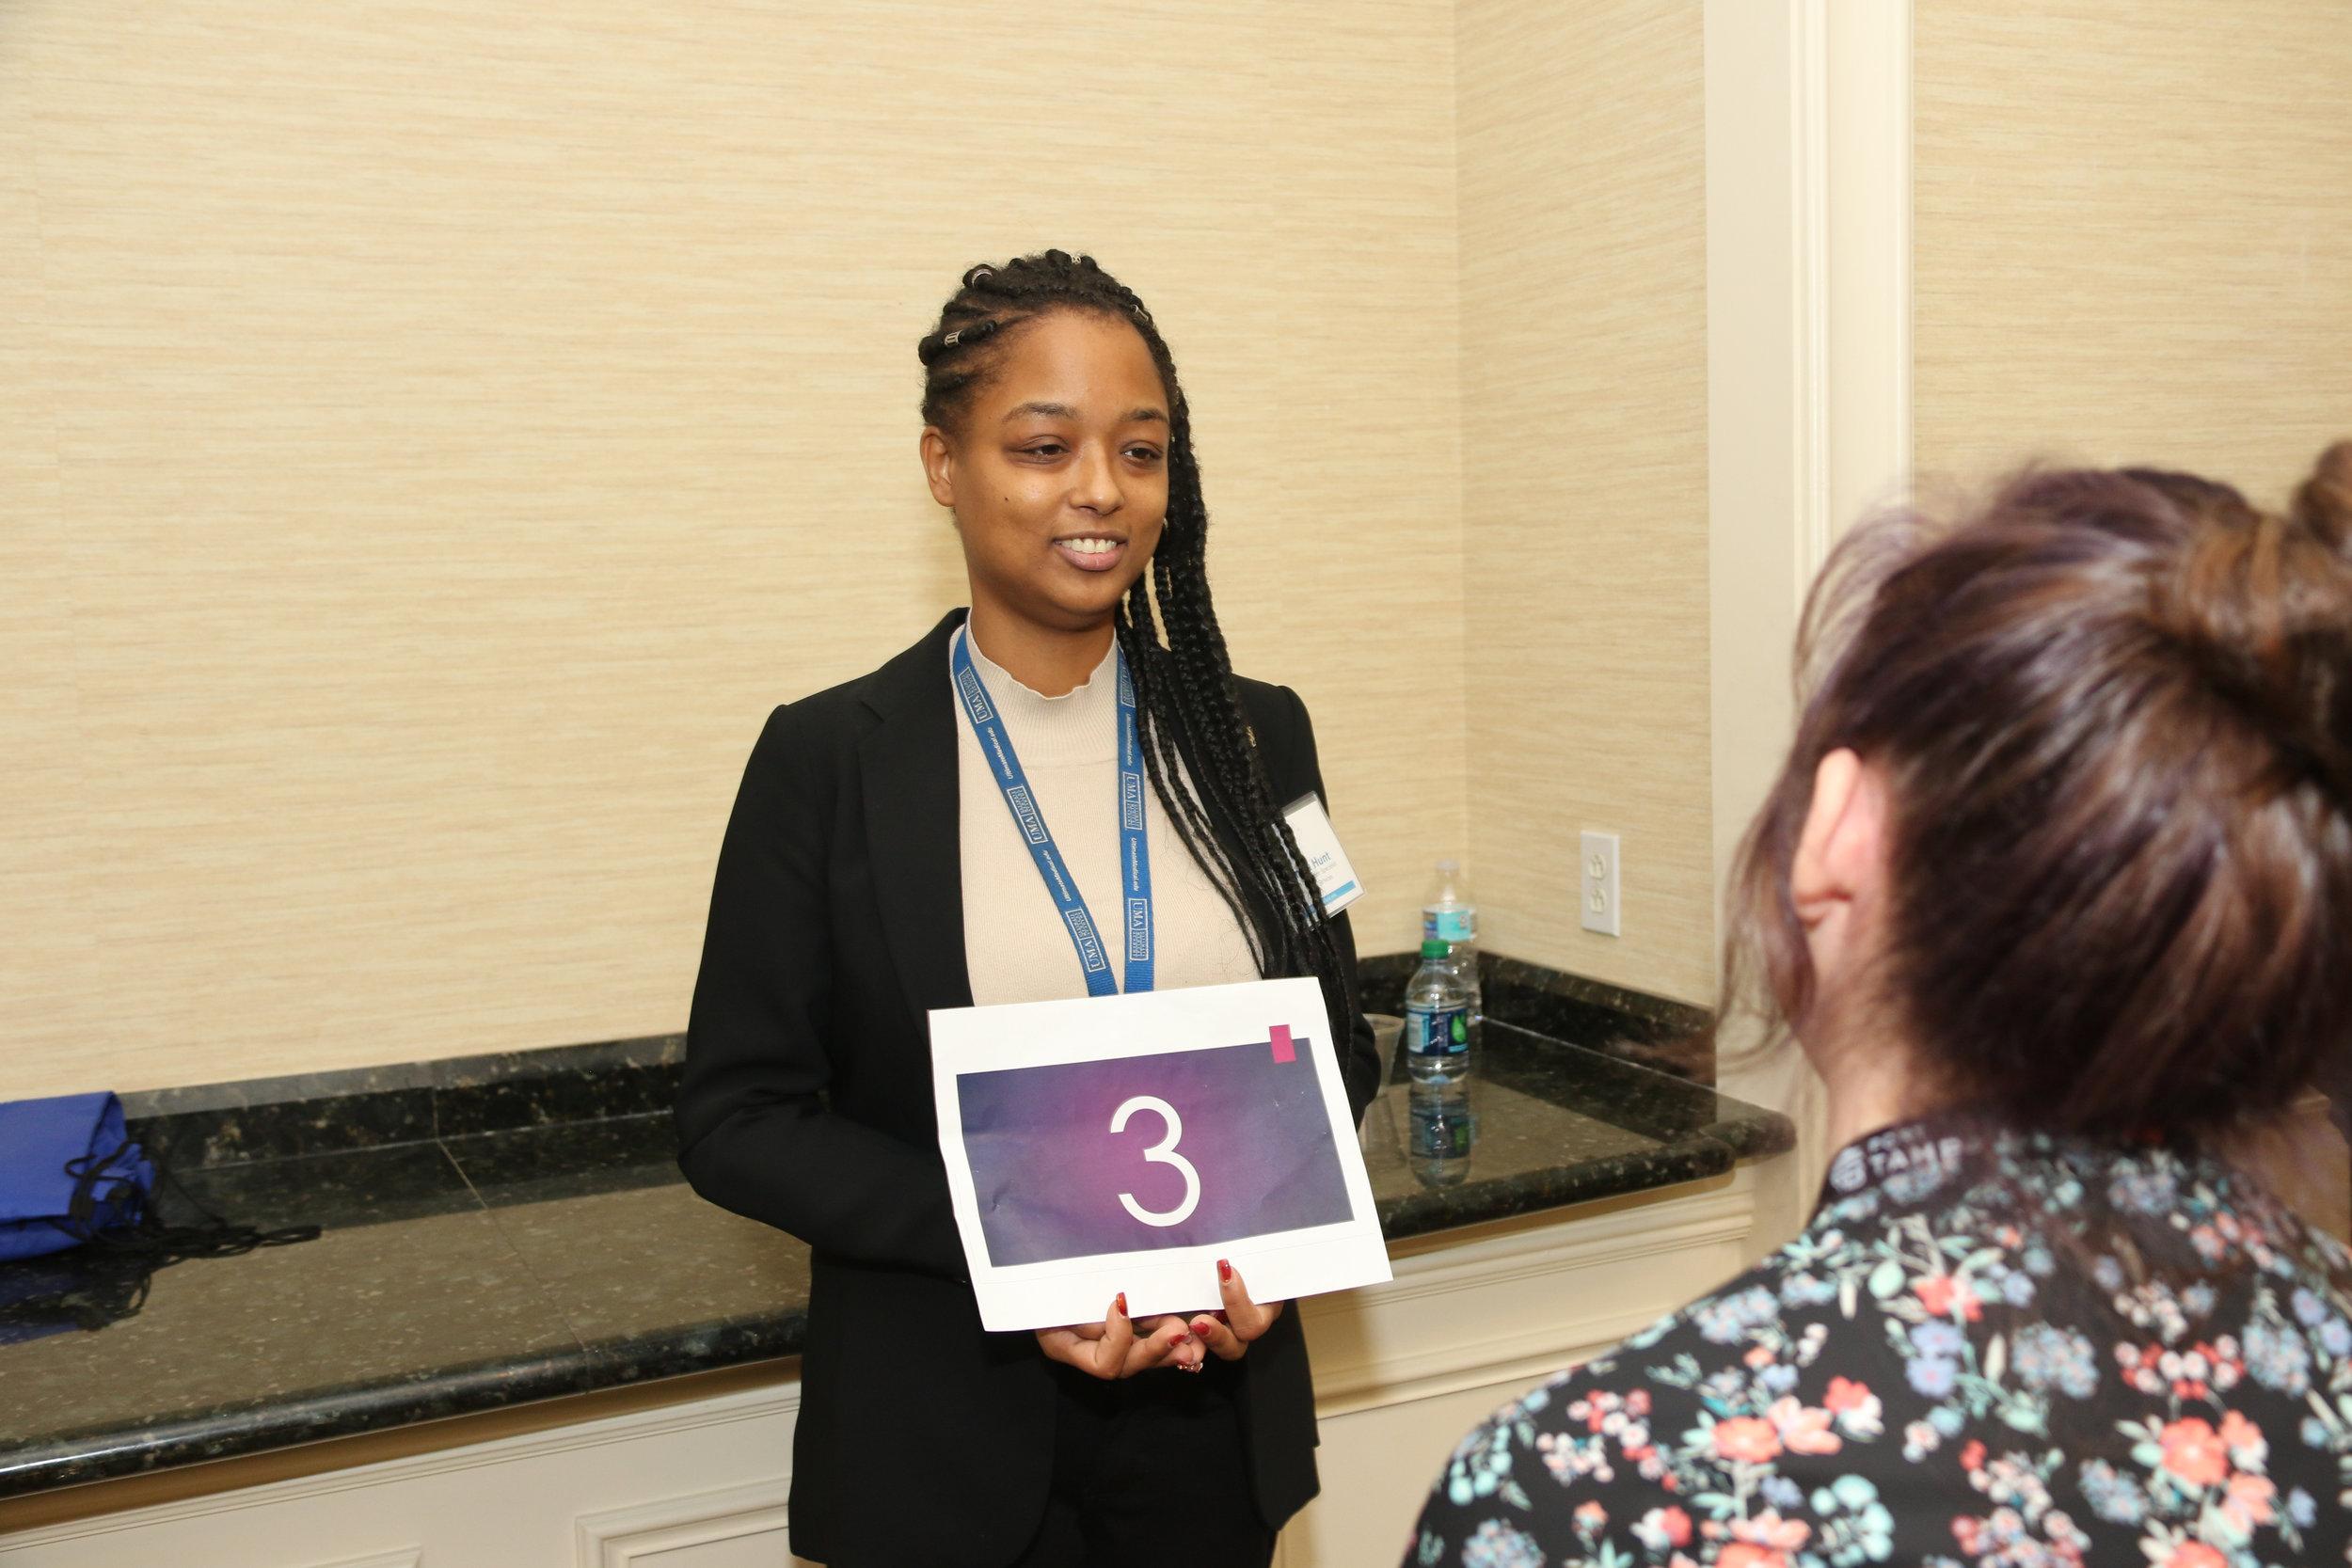 275_WomensConference_10-26-17.jpg